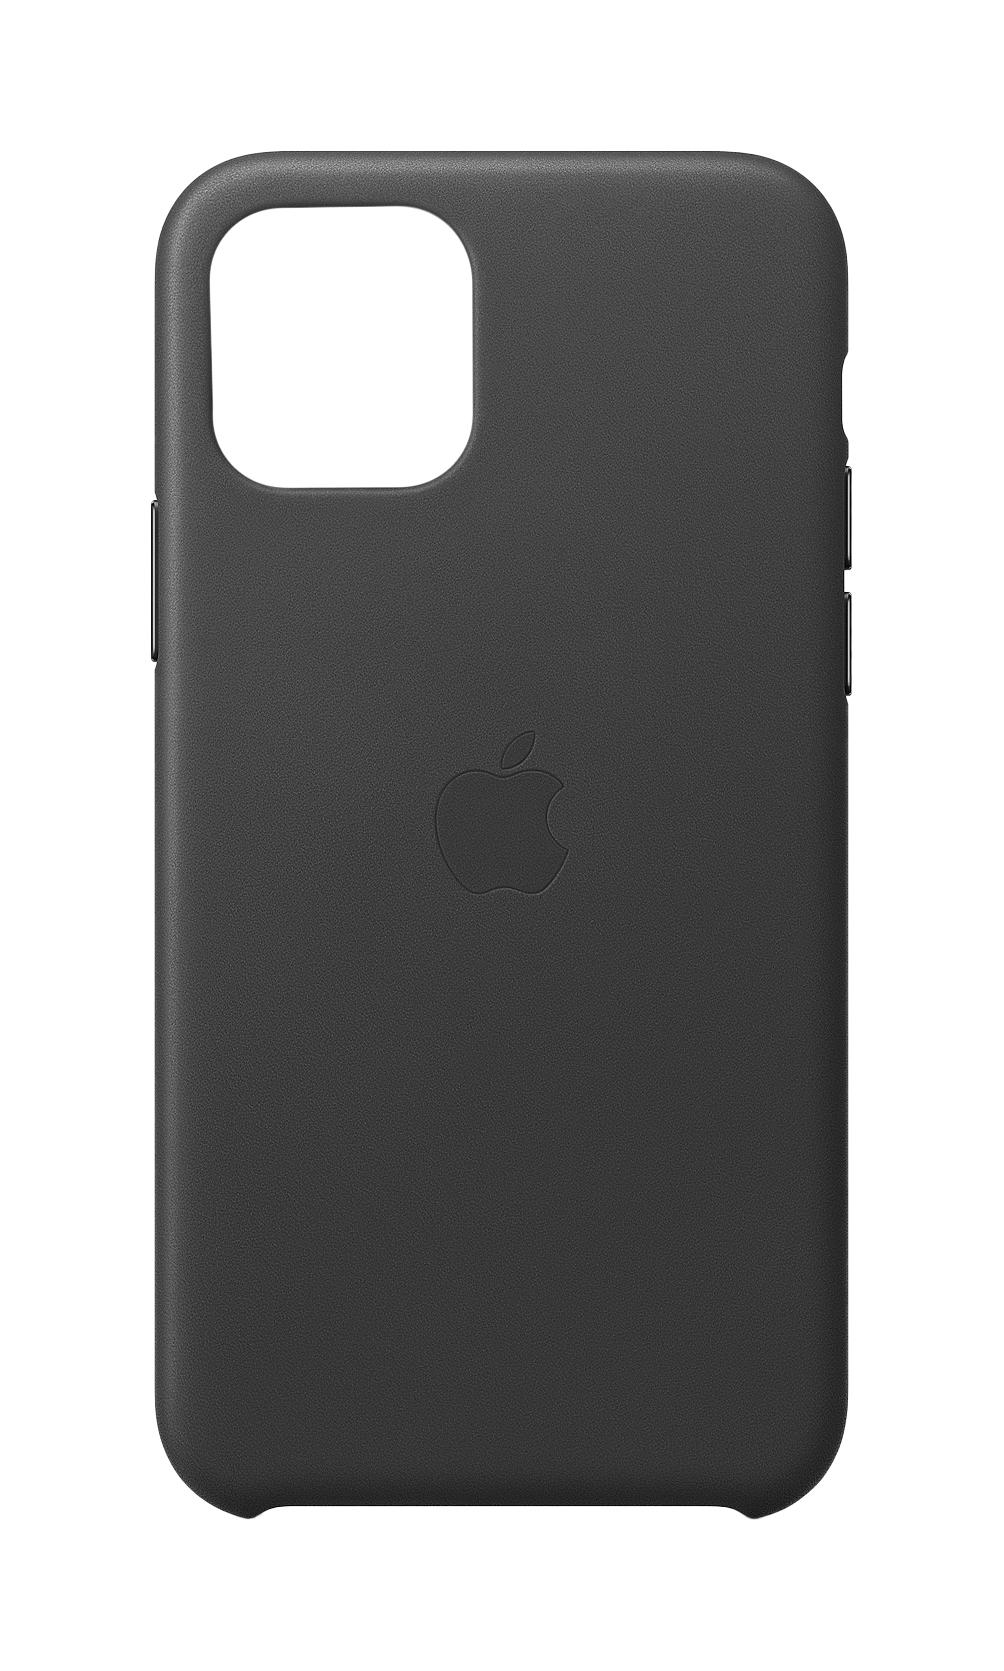 "Apple MWYE2ZM/A?ES funda para teléfono móvil 14,7 cm (5.8"") Negro"